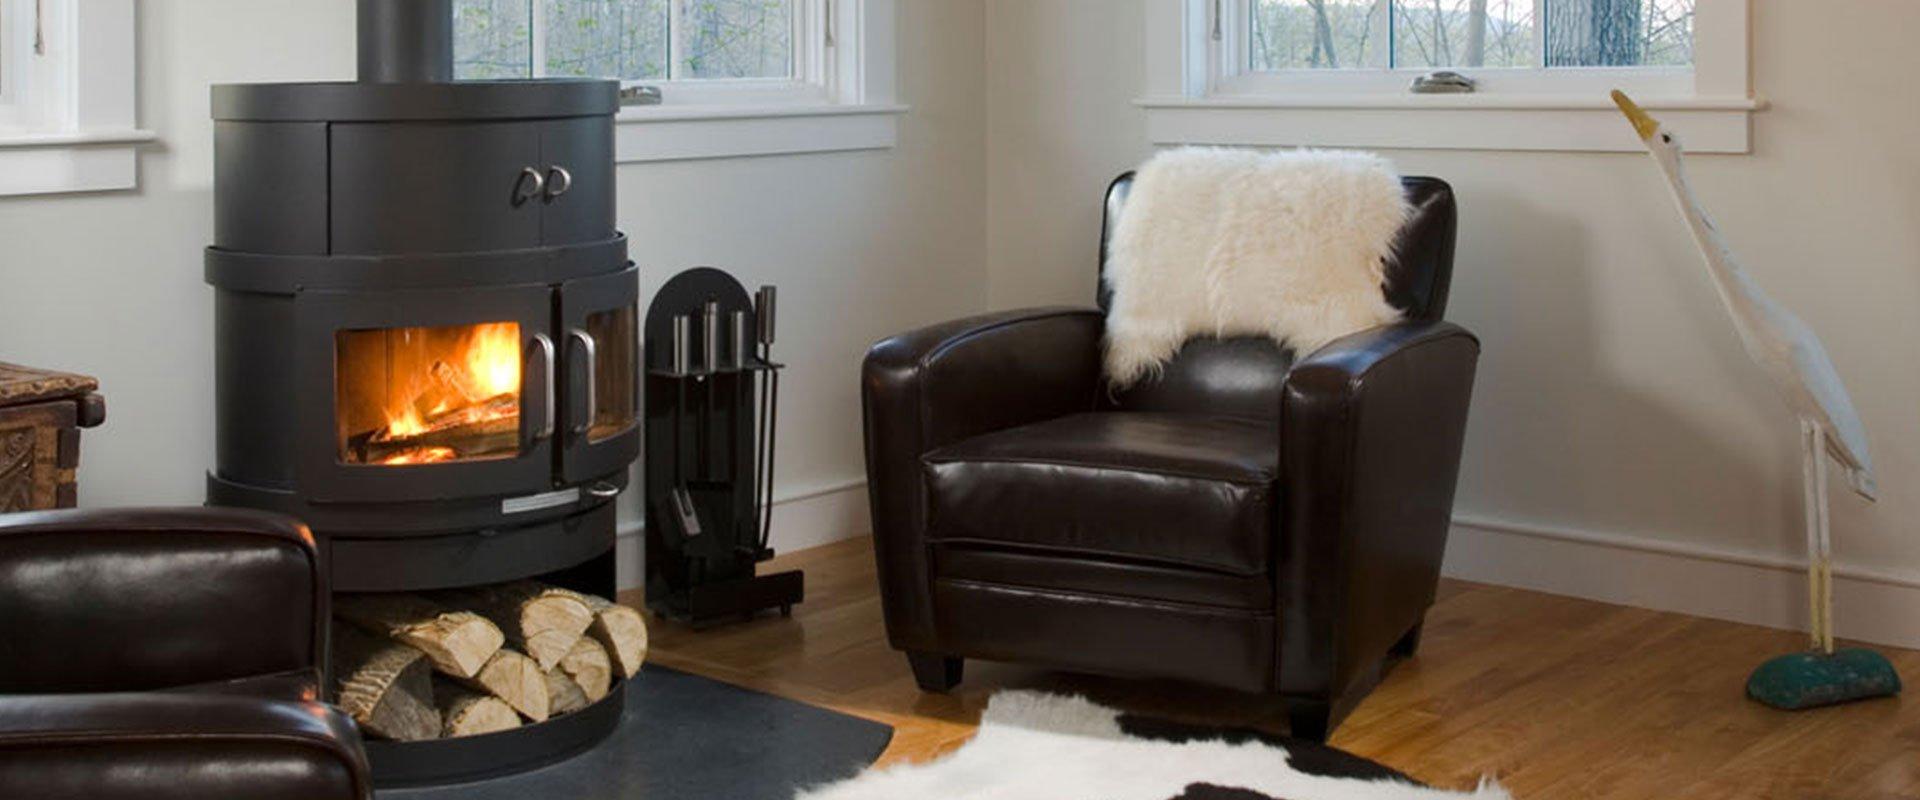 sofa next to woodburner